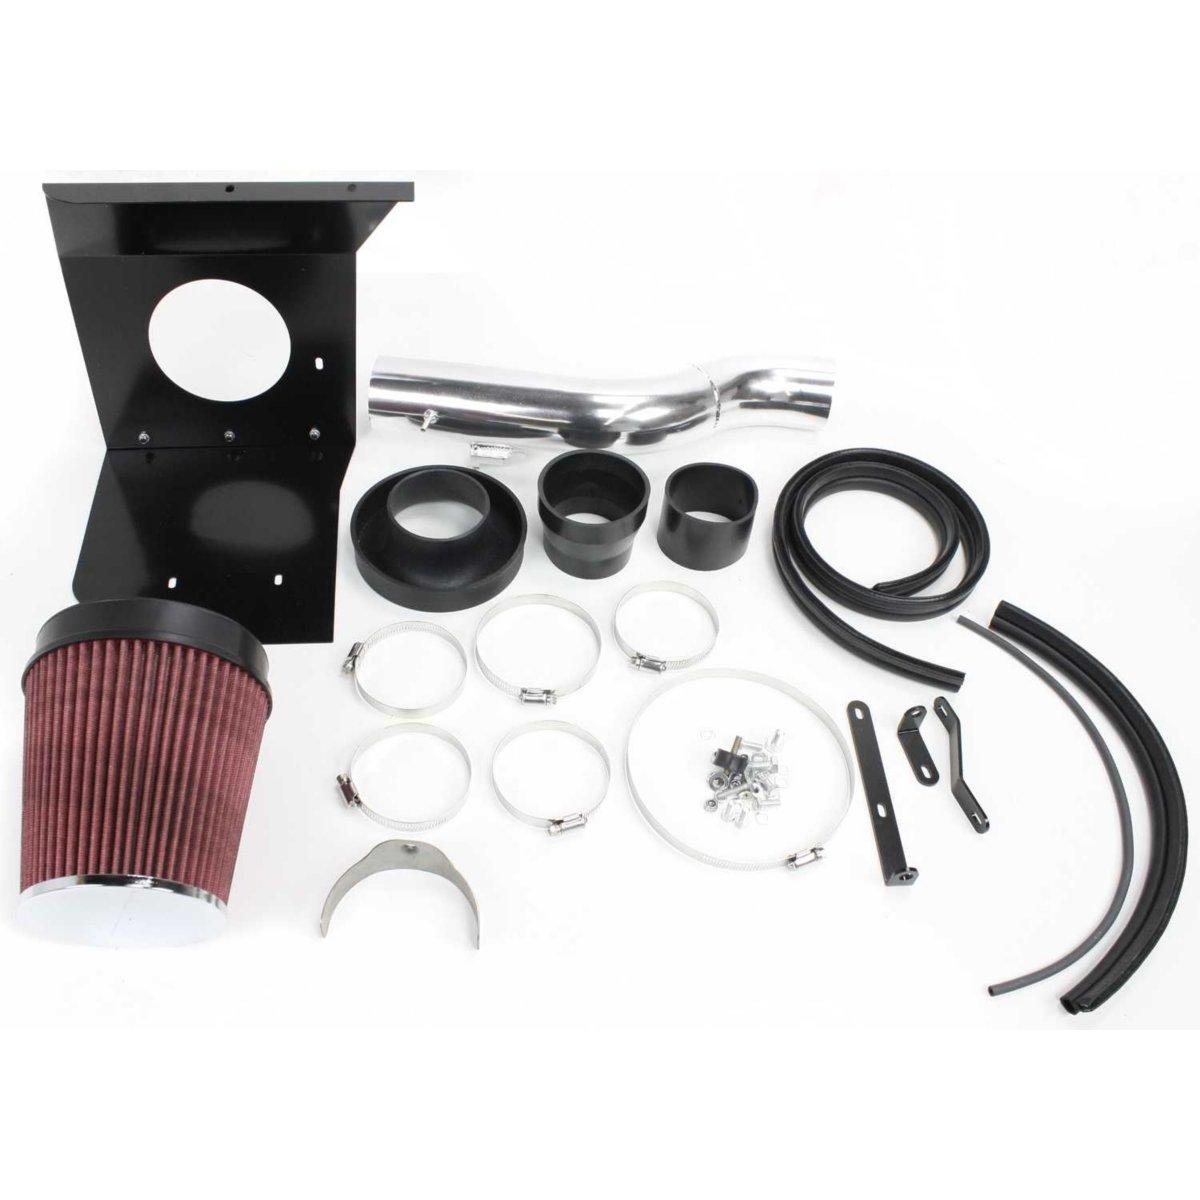 Cotton-Gauze-Aluminum-Polished-Cold-Air-Intake-Fits-05-14-Toyota-Tacoma